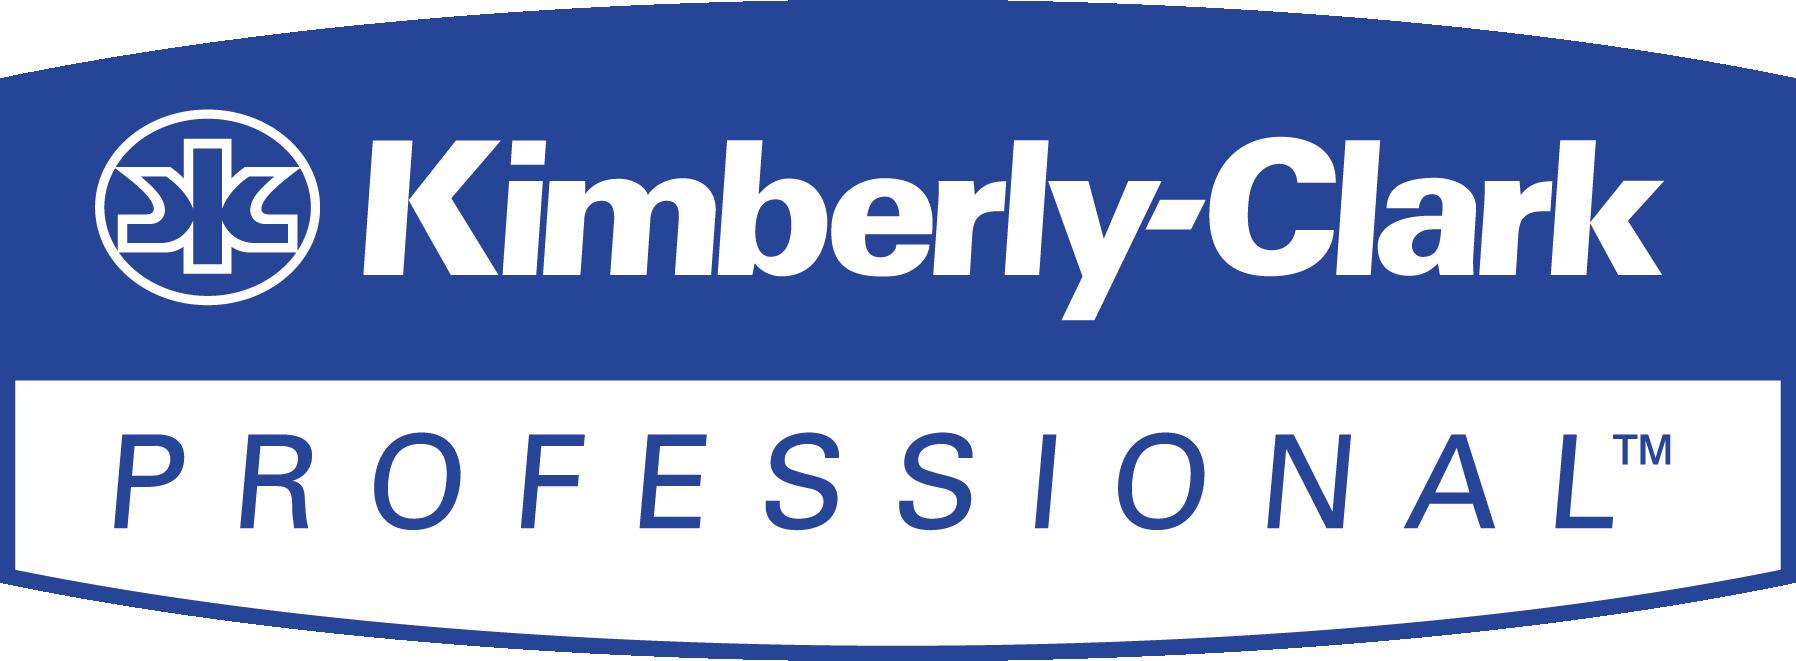 Kimberly-Clark Proffesional